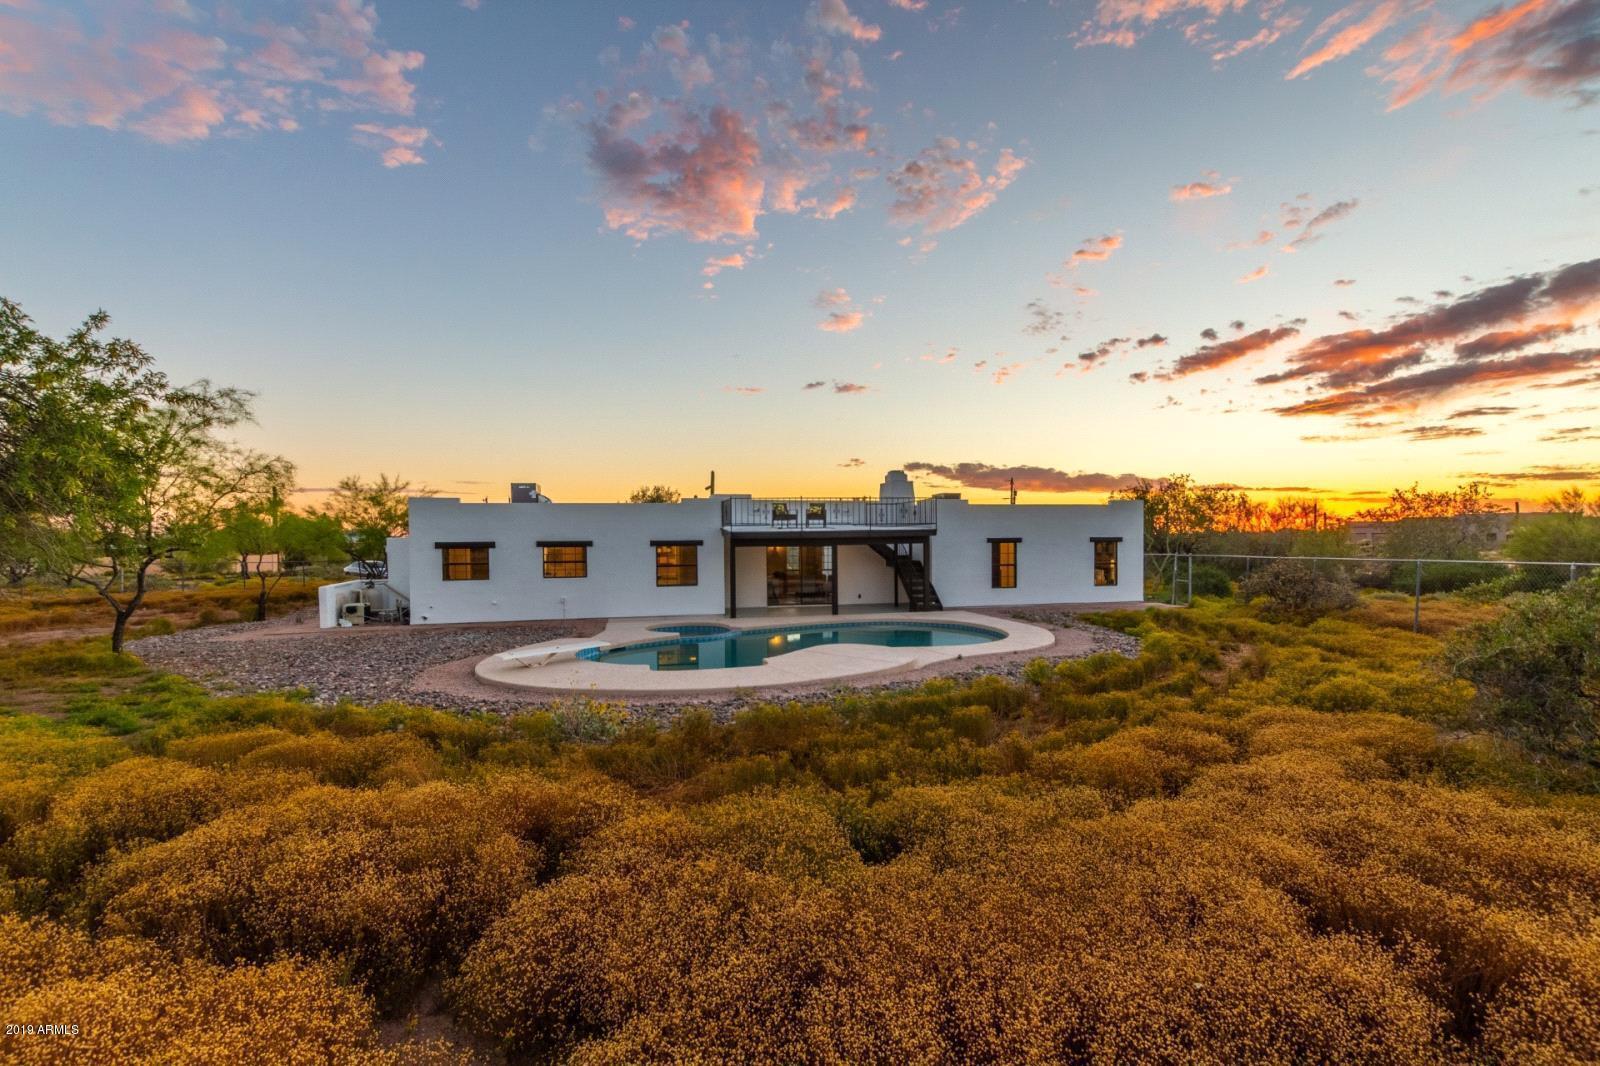 MLS 5917728 651 N VAL VISTA Road, Apache Junction, AZ 85119 Apache Junction AZ Private Pool